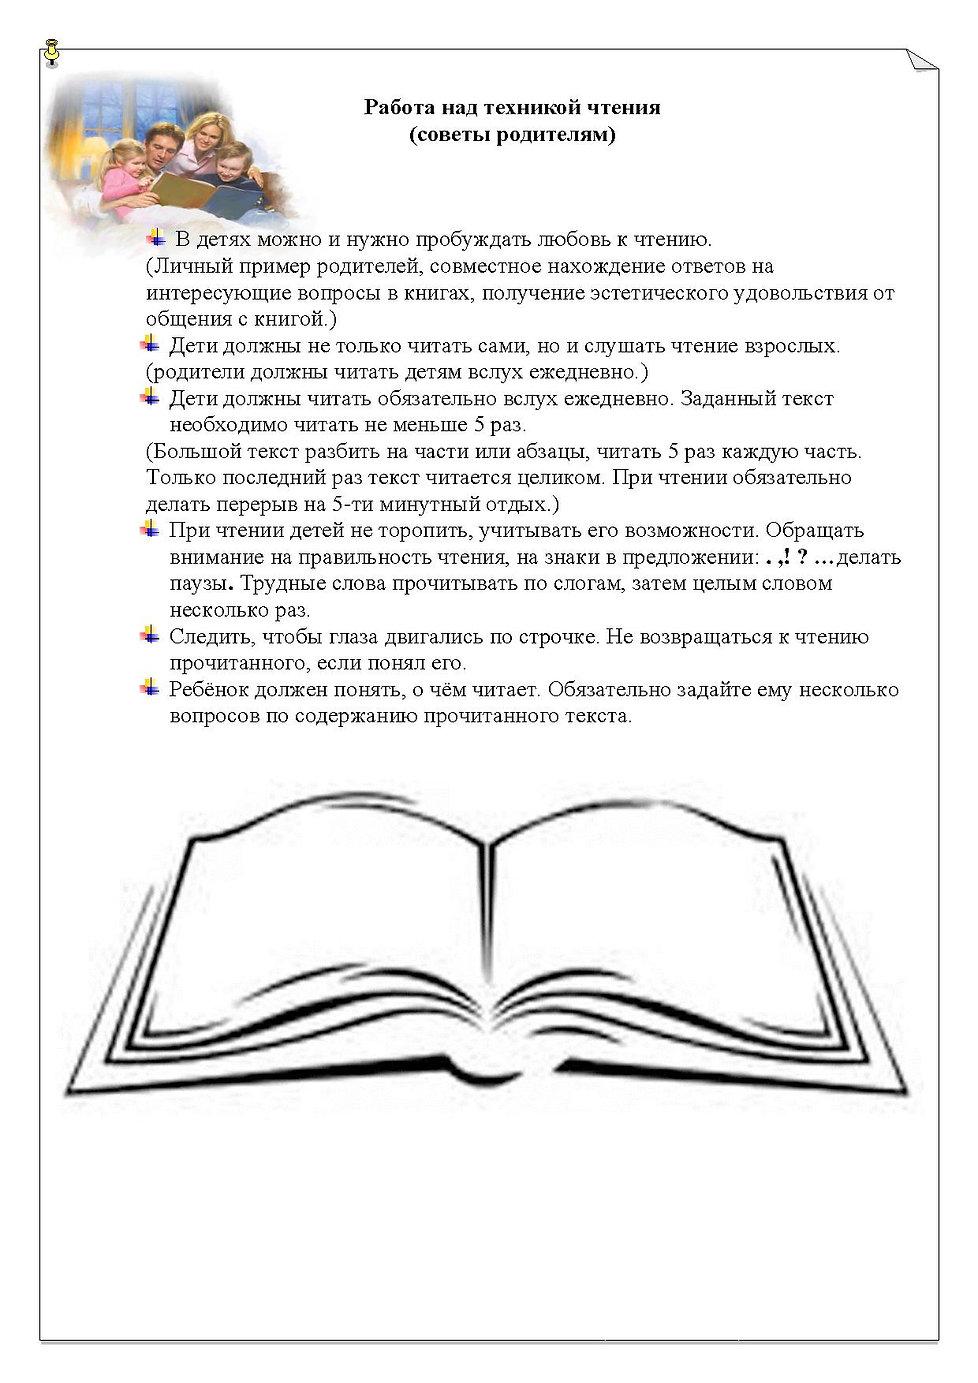 работа над техникой чтения.jpg